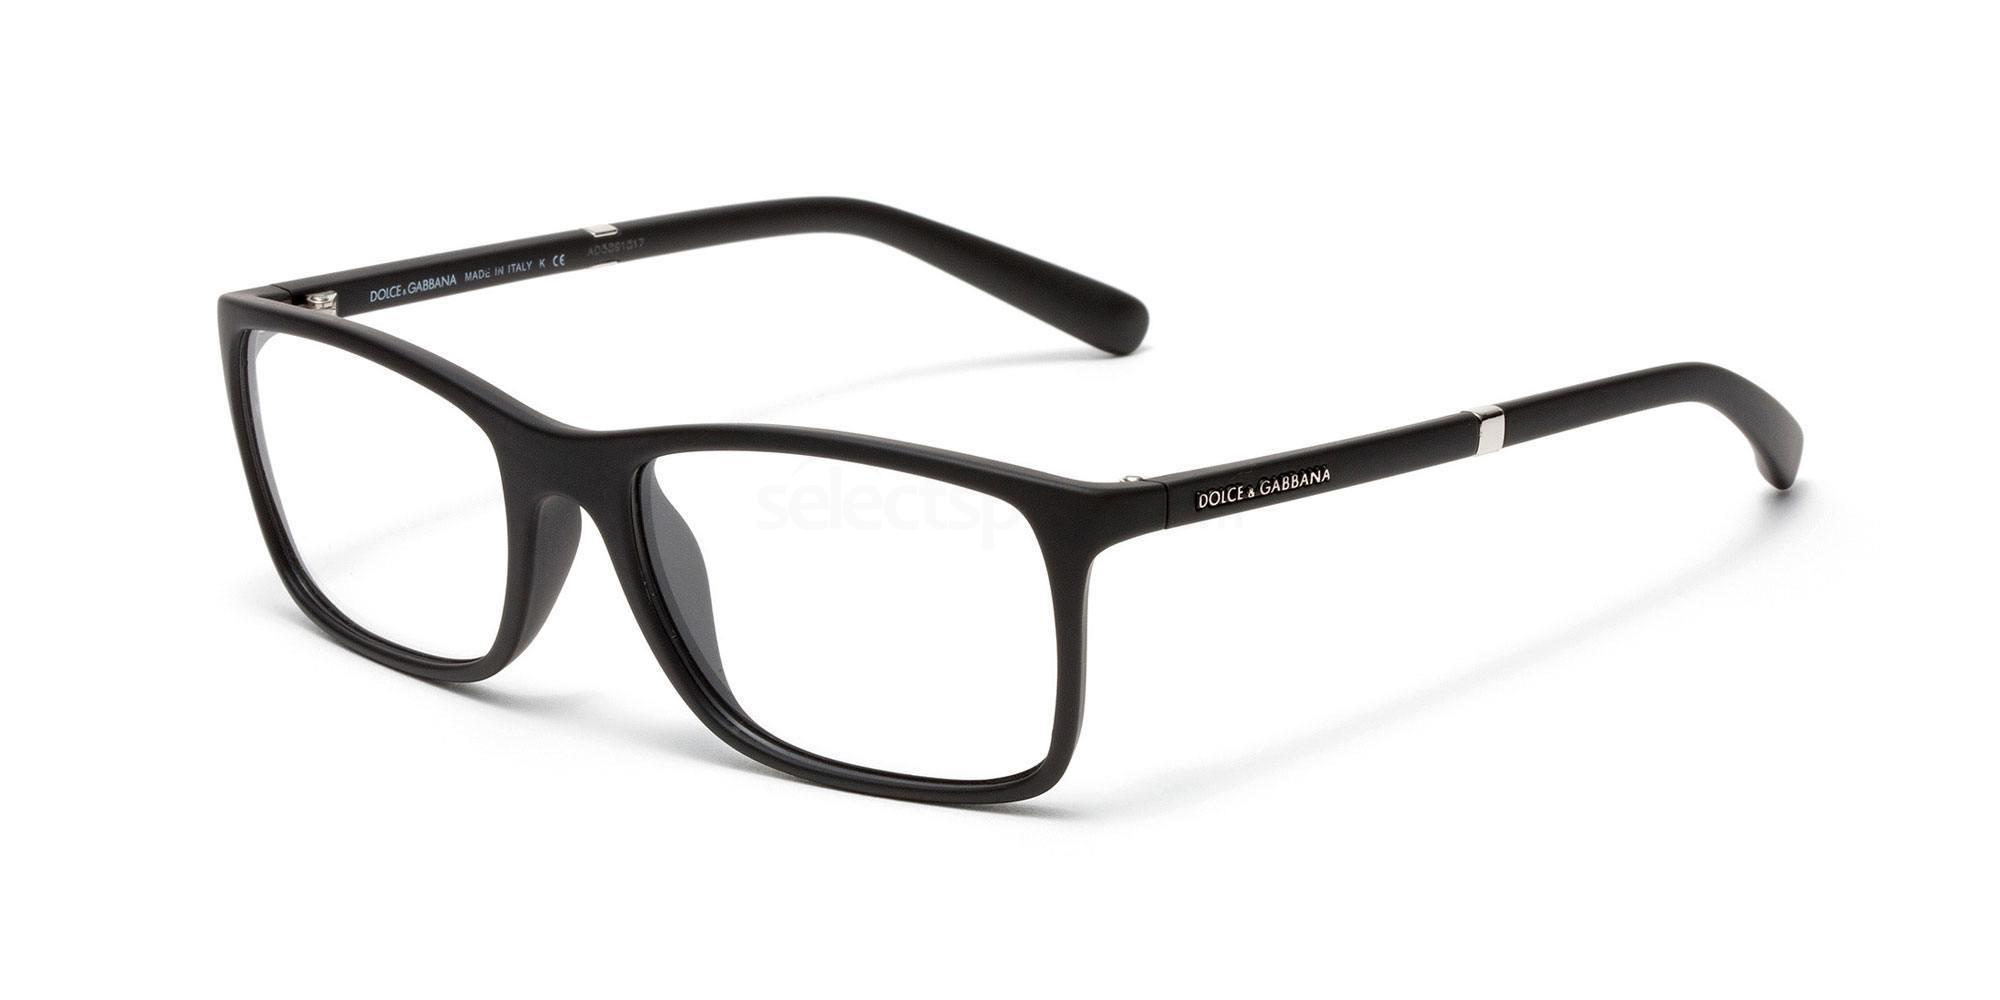 2616 DG5004 LIFESTYLE Glasses, Dolce & Gabbana